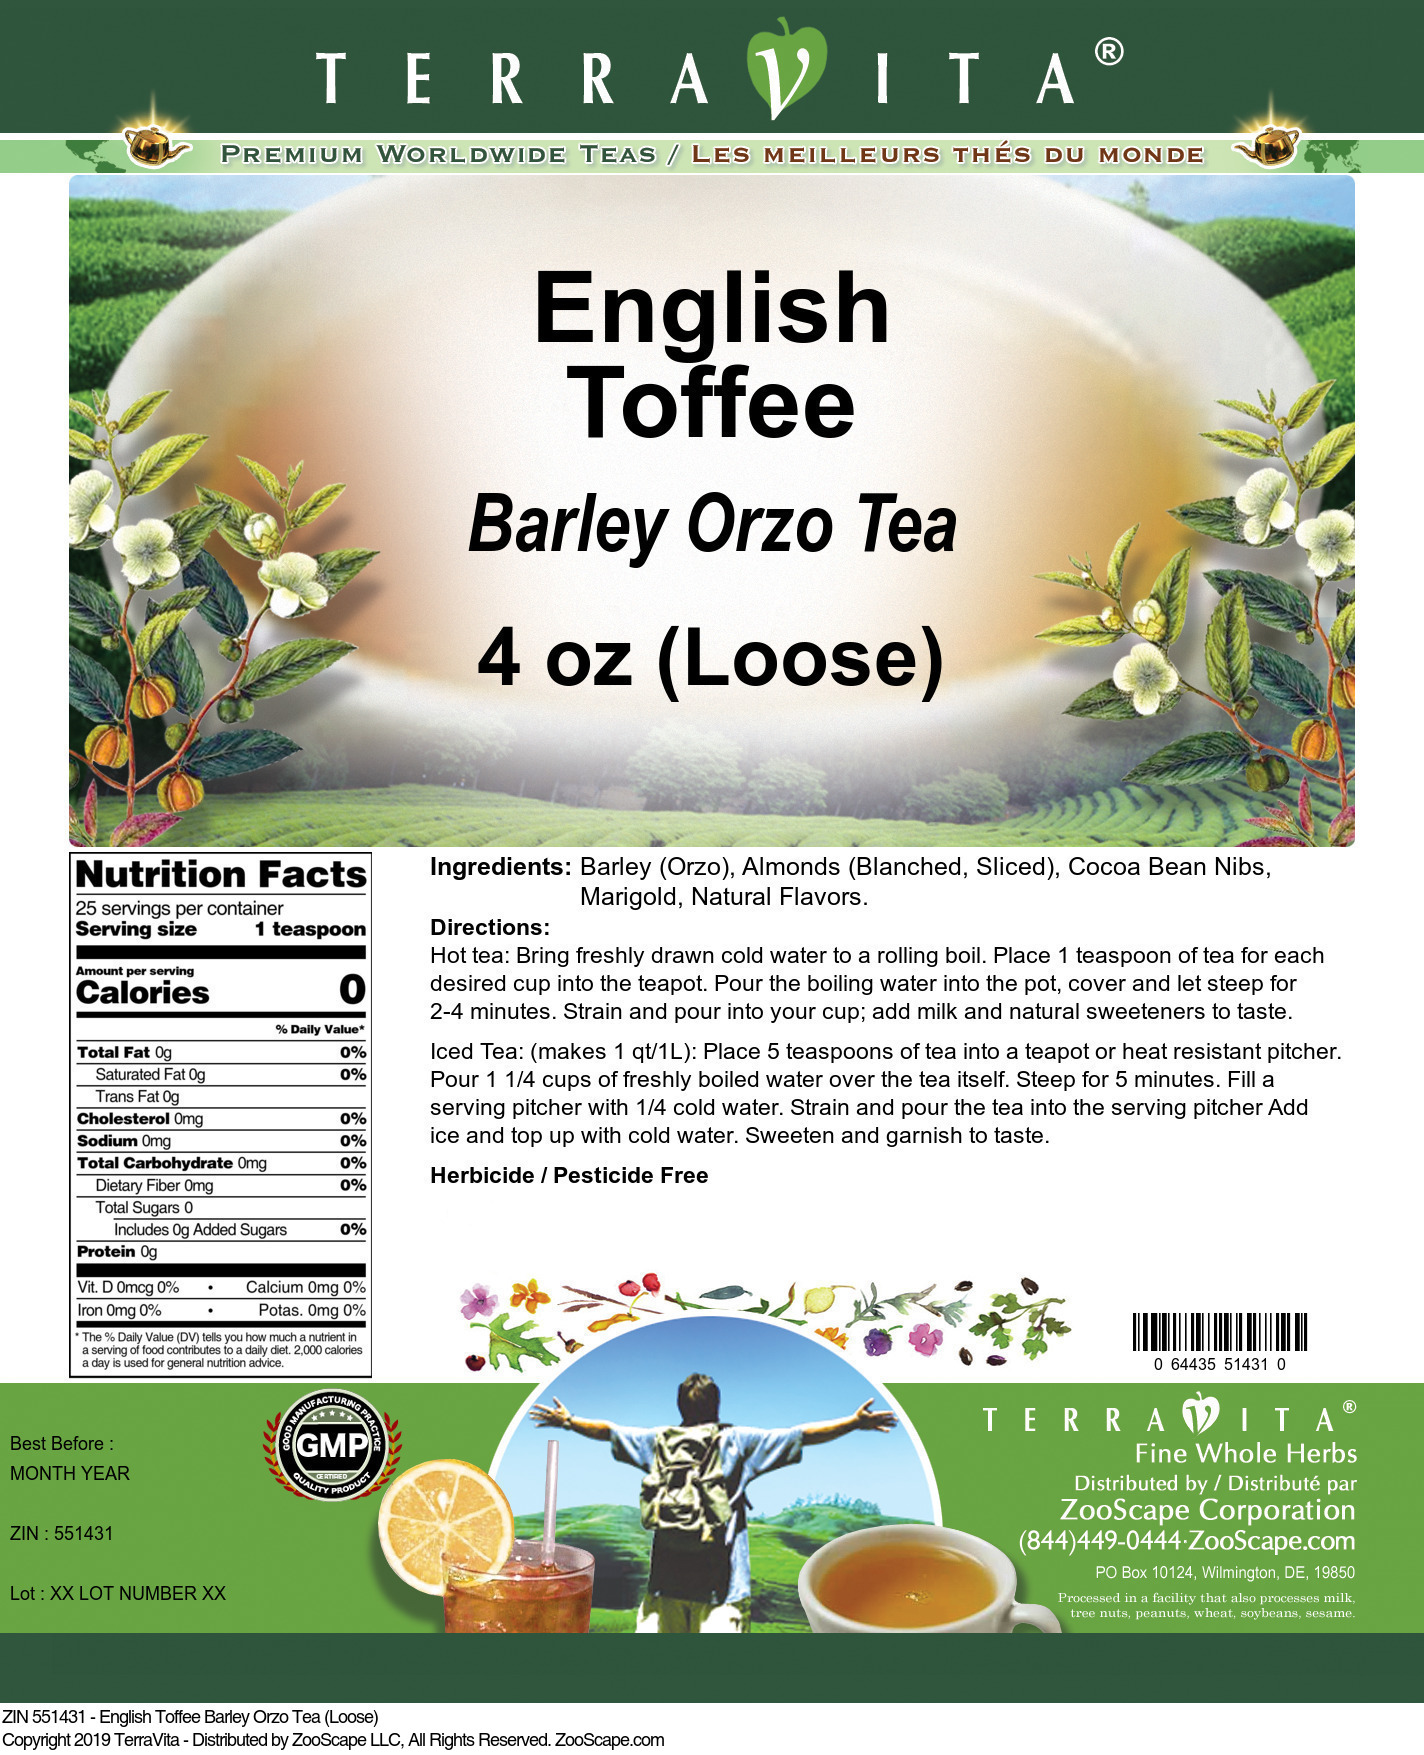 English Toffee Barley Orzo Tea (Loose)